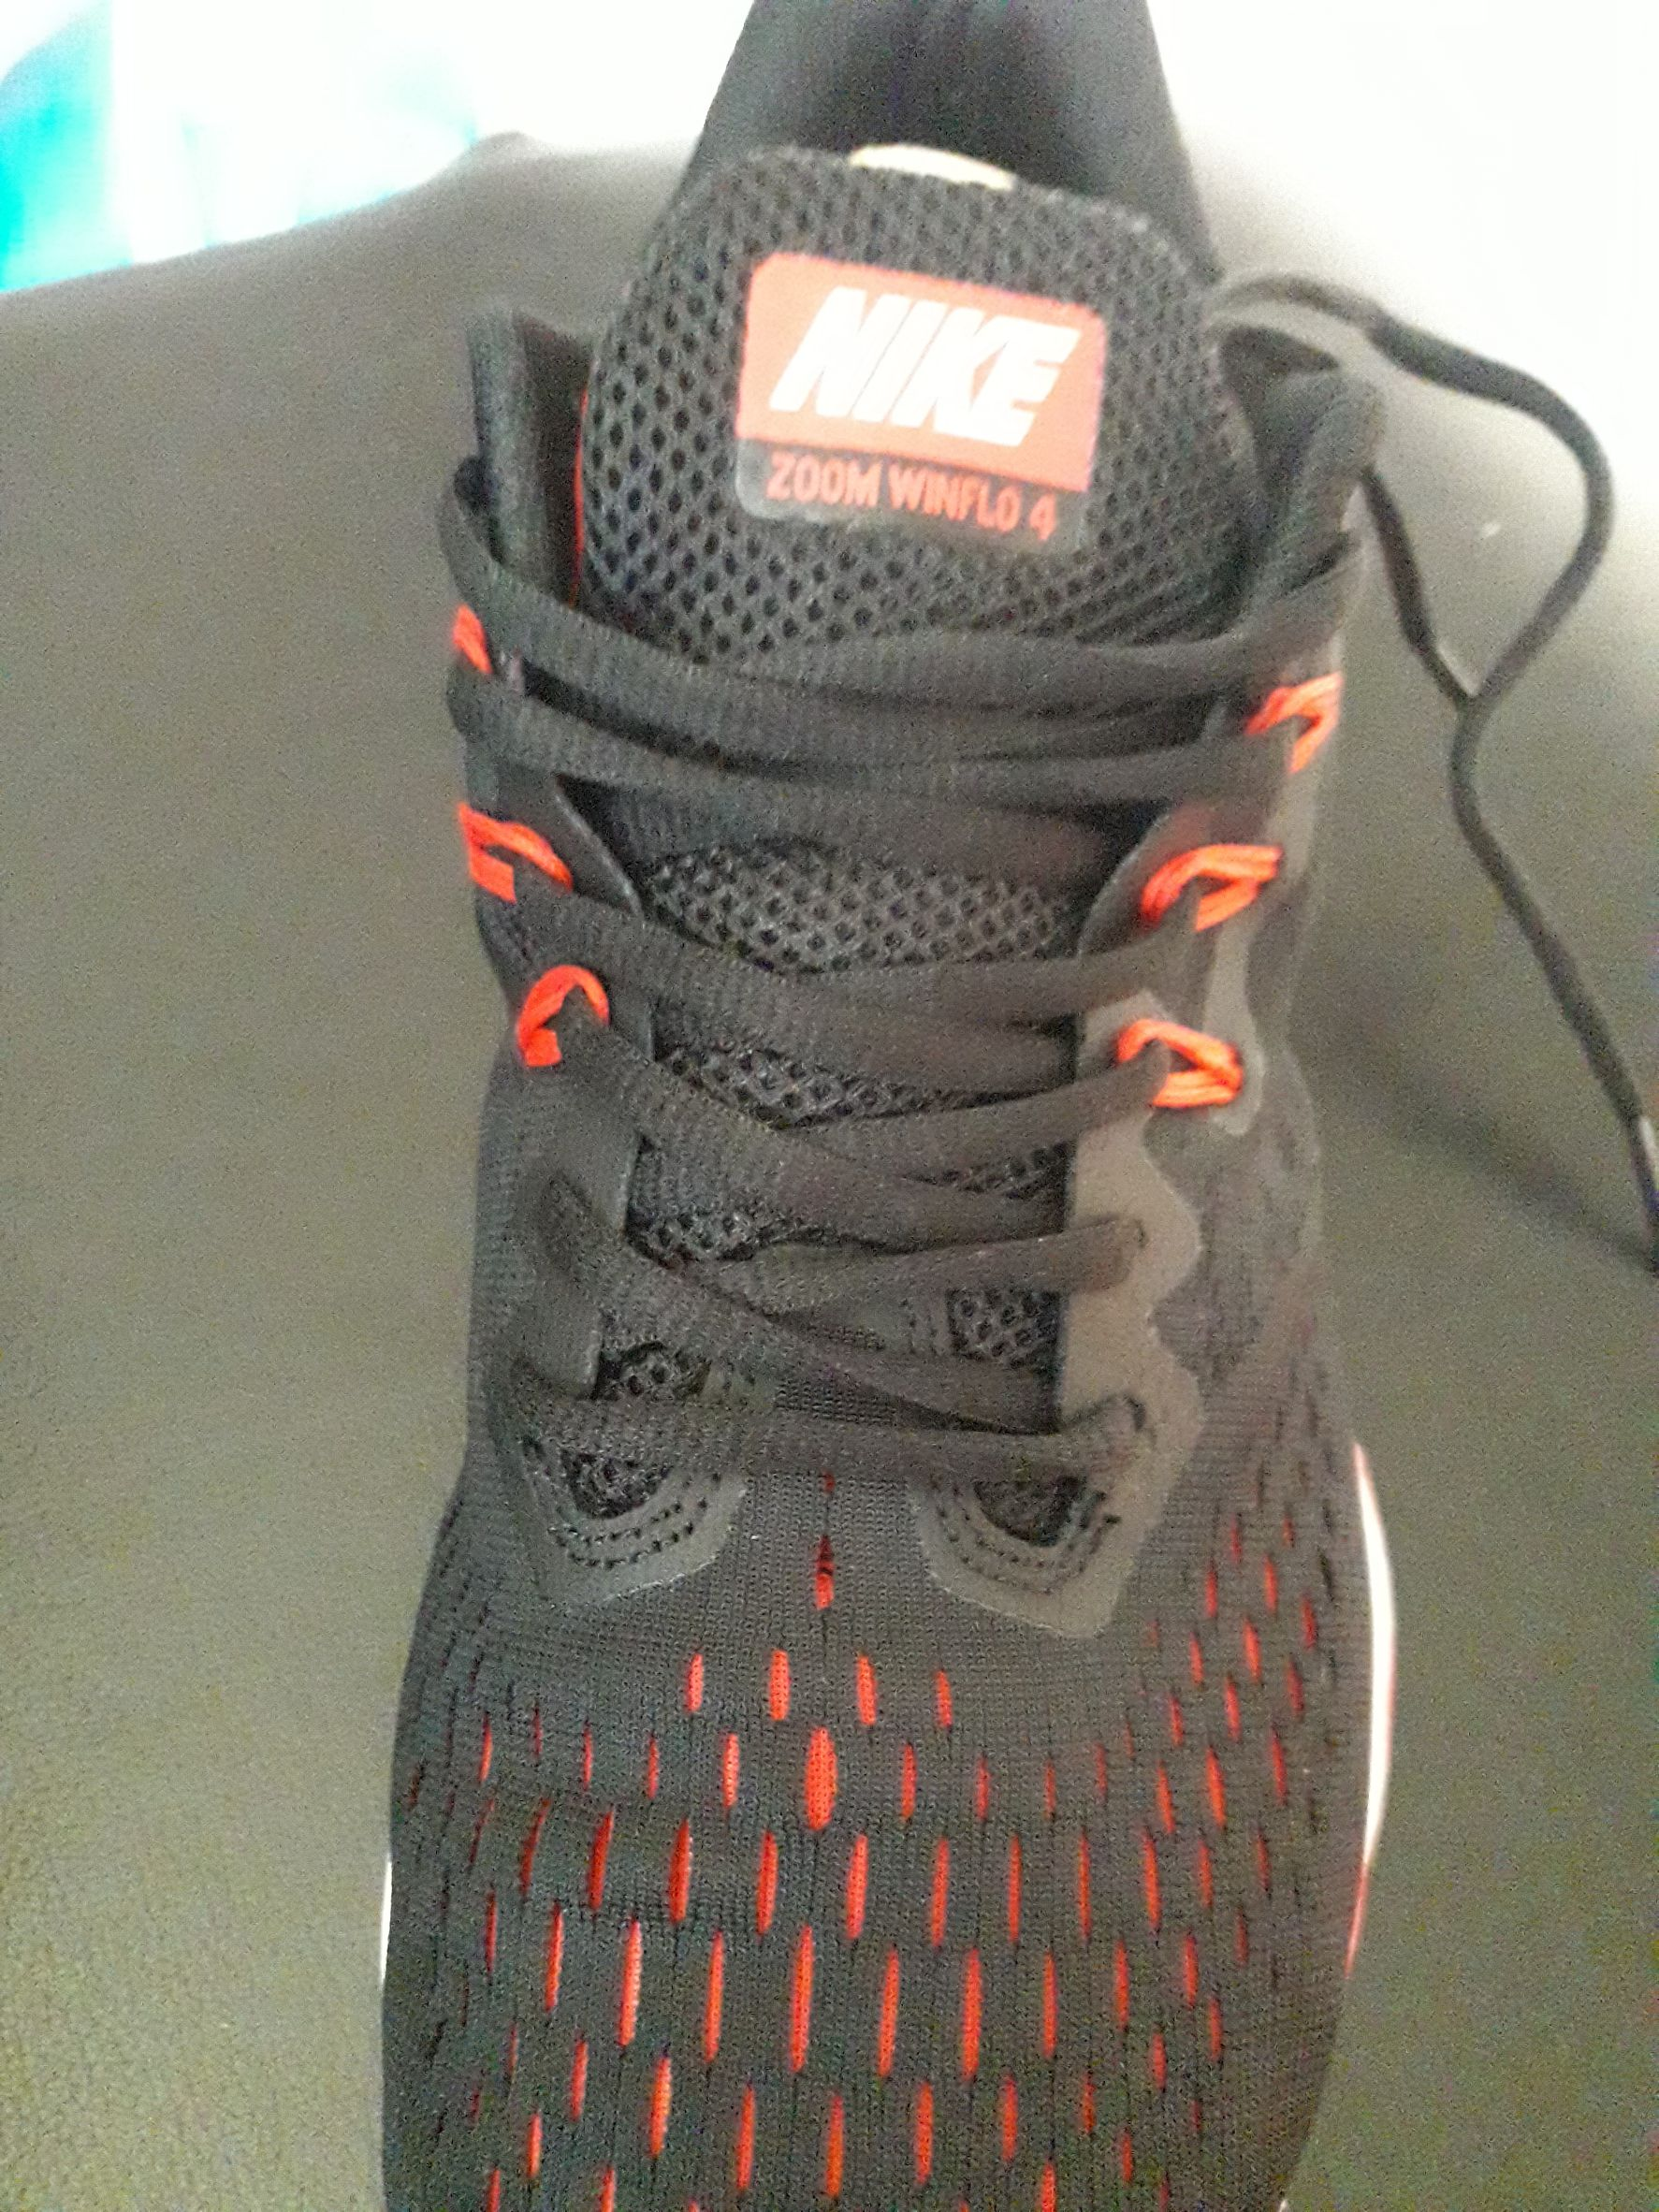 new style 360ec 0dccb ดูรองเท้าให้หน่อยครับ ใช่ NIKE ของแท้ไหม - Pantip